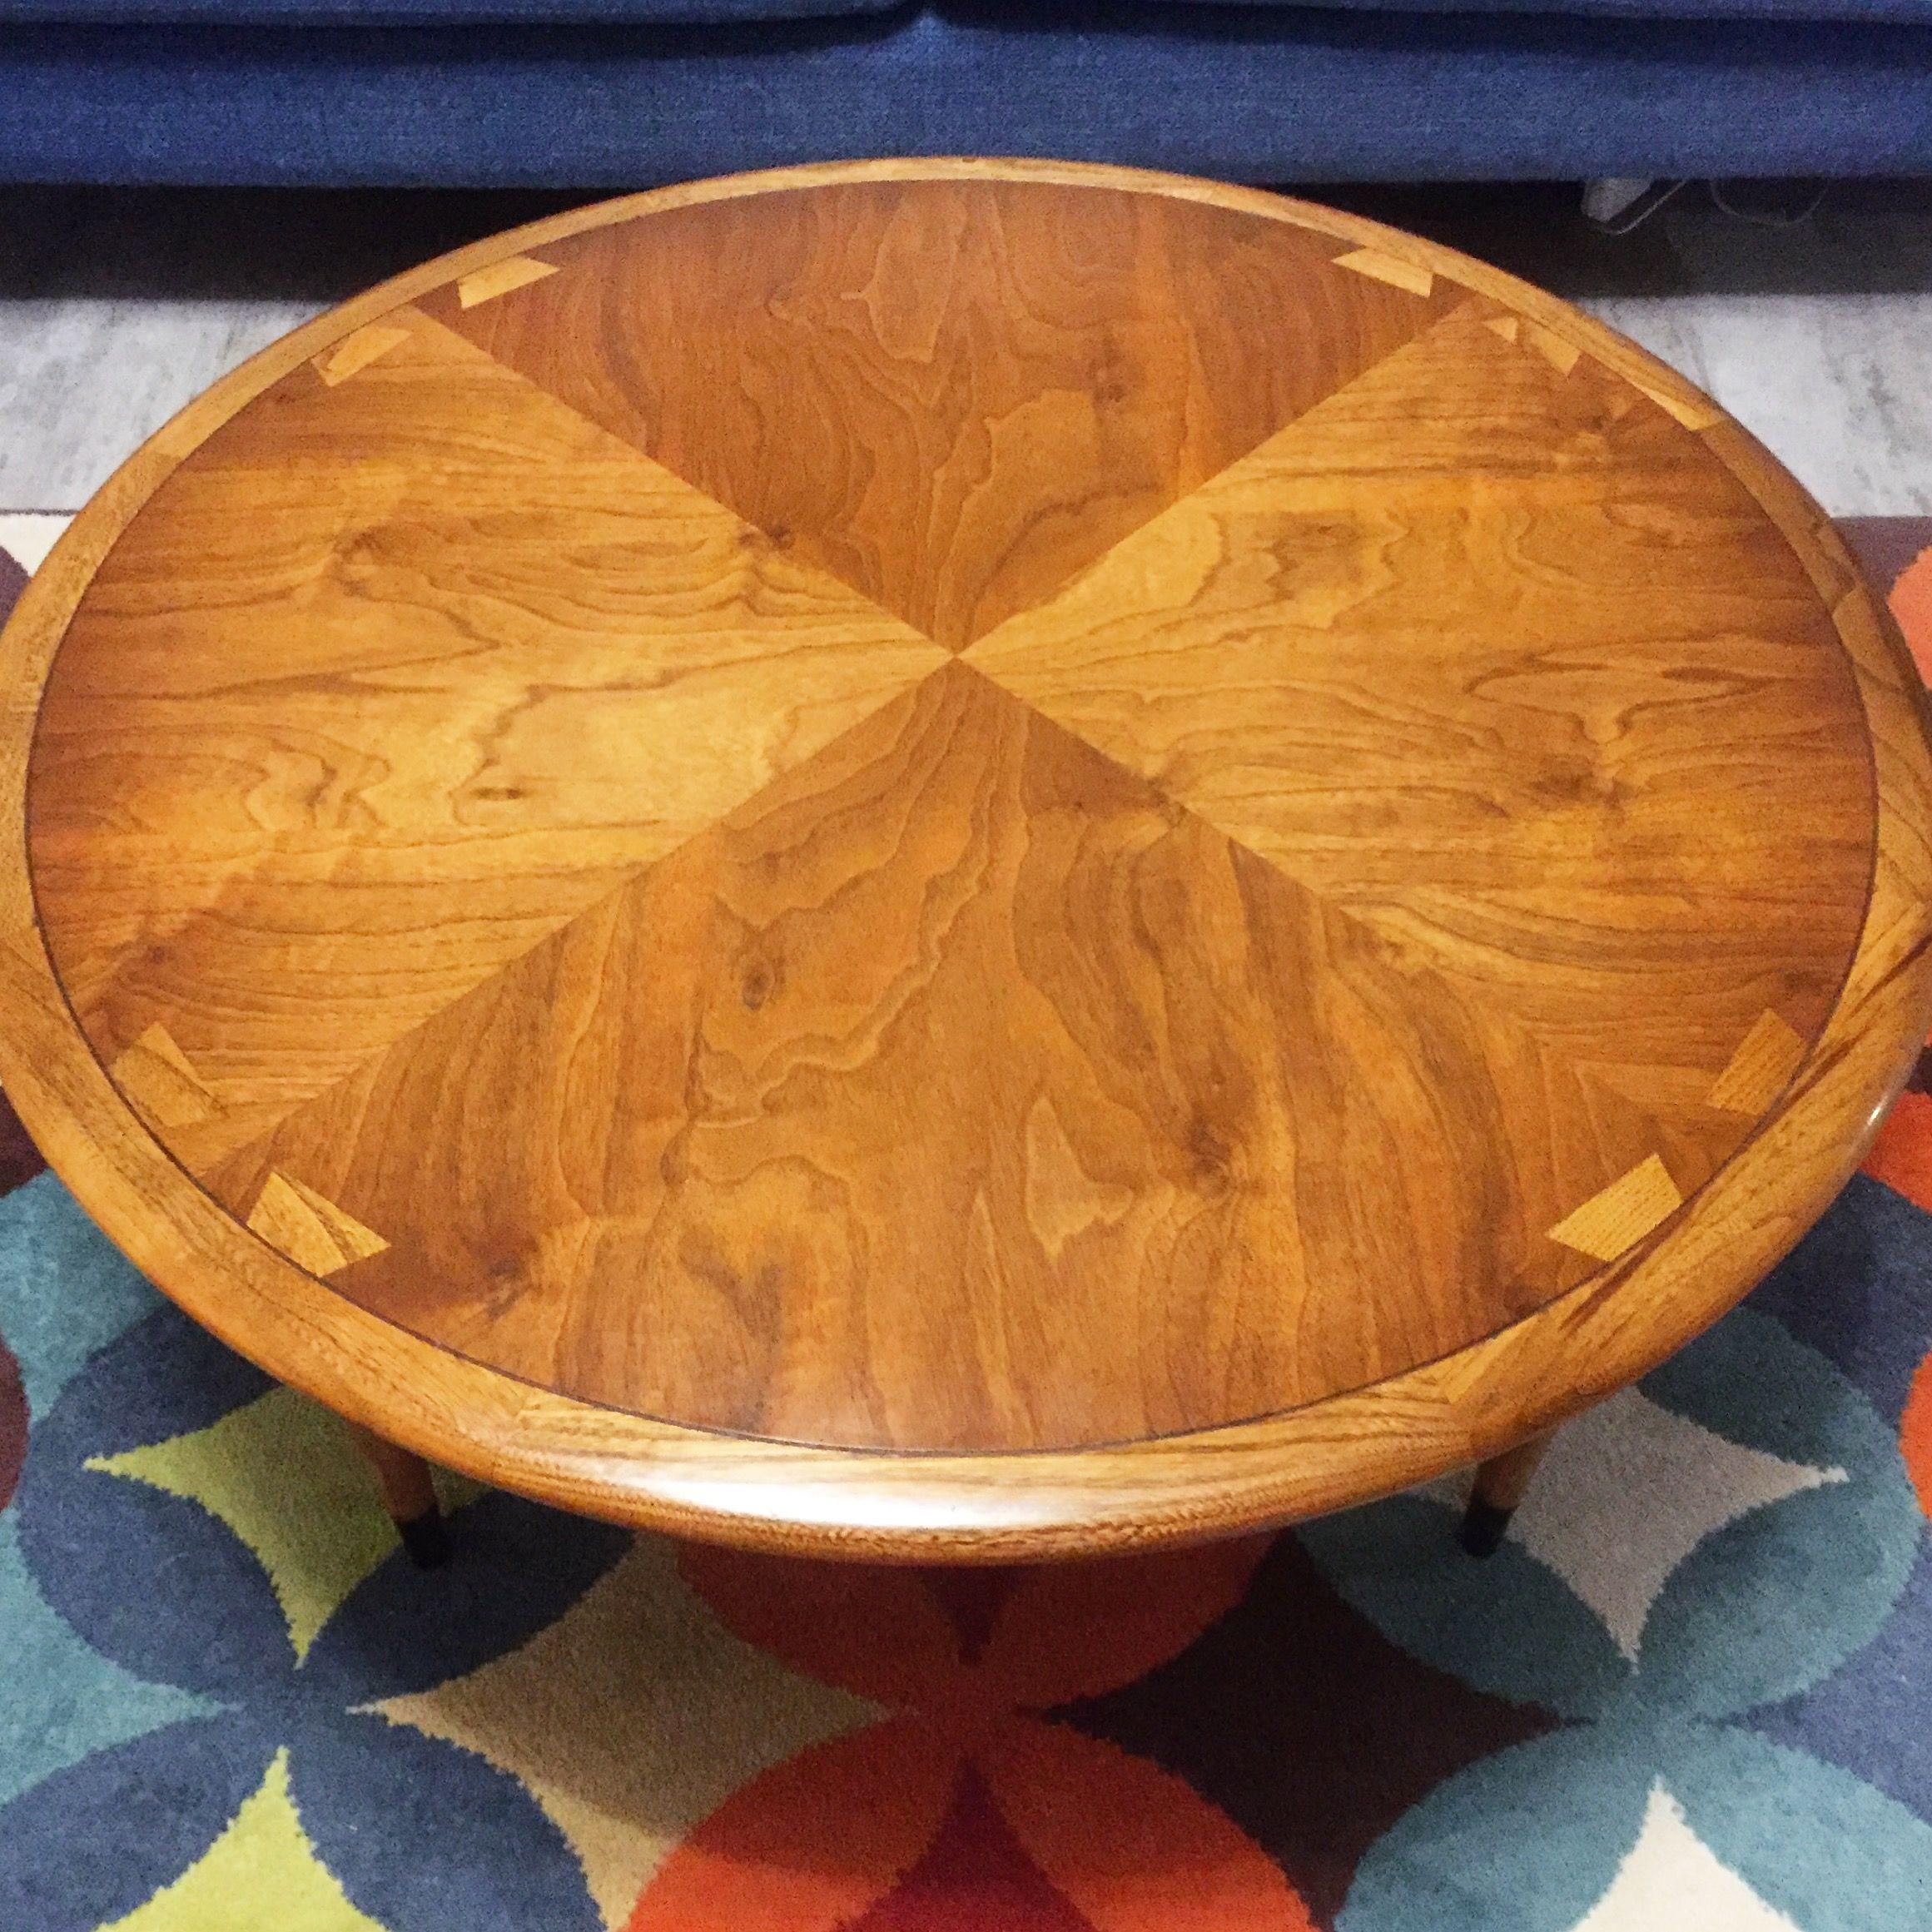 Lane Acclaim Round Coffee Table Mid Century Decor Century Decor Coffee Table [ 2321 x 2321 Pixel ]